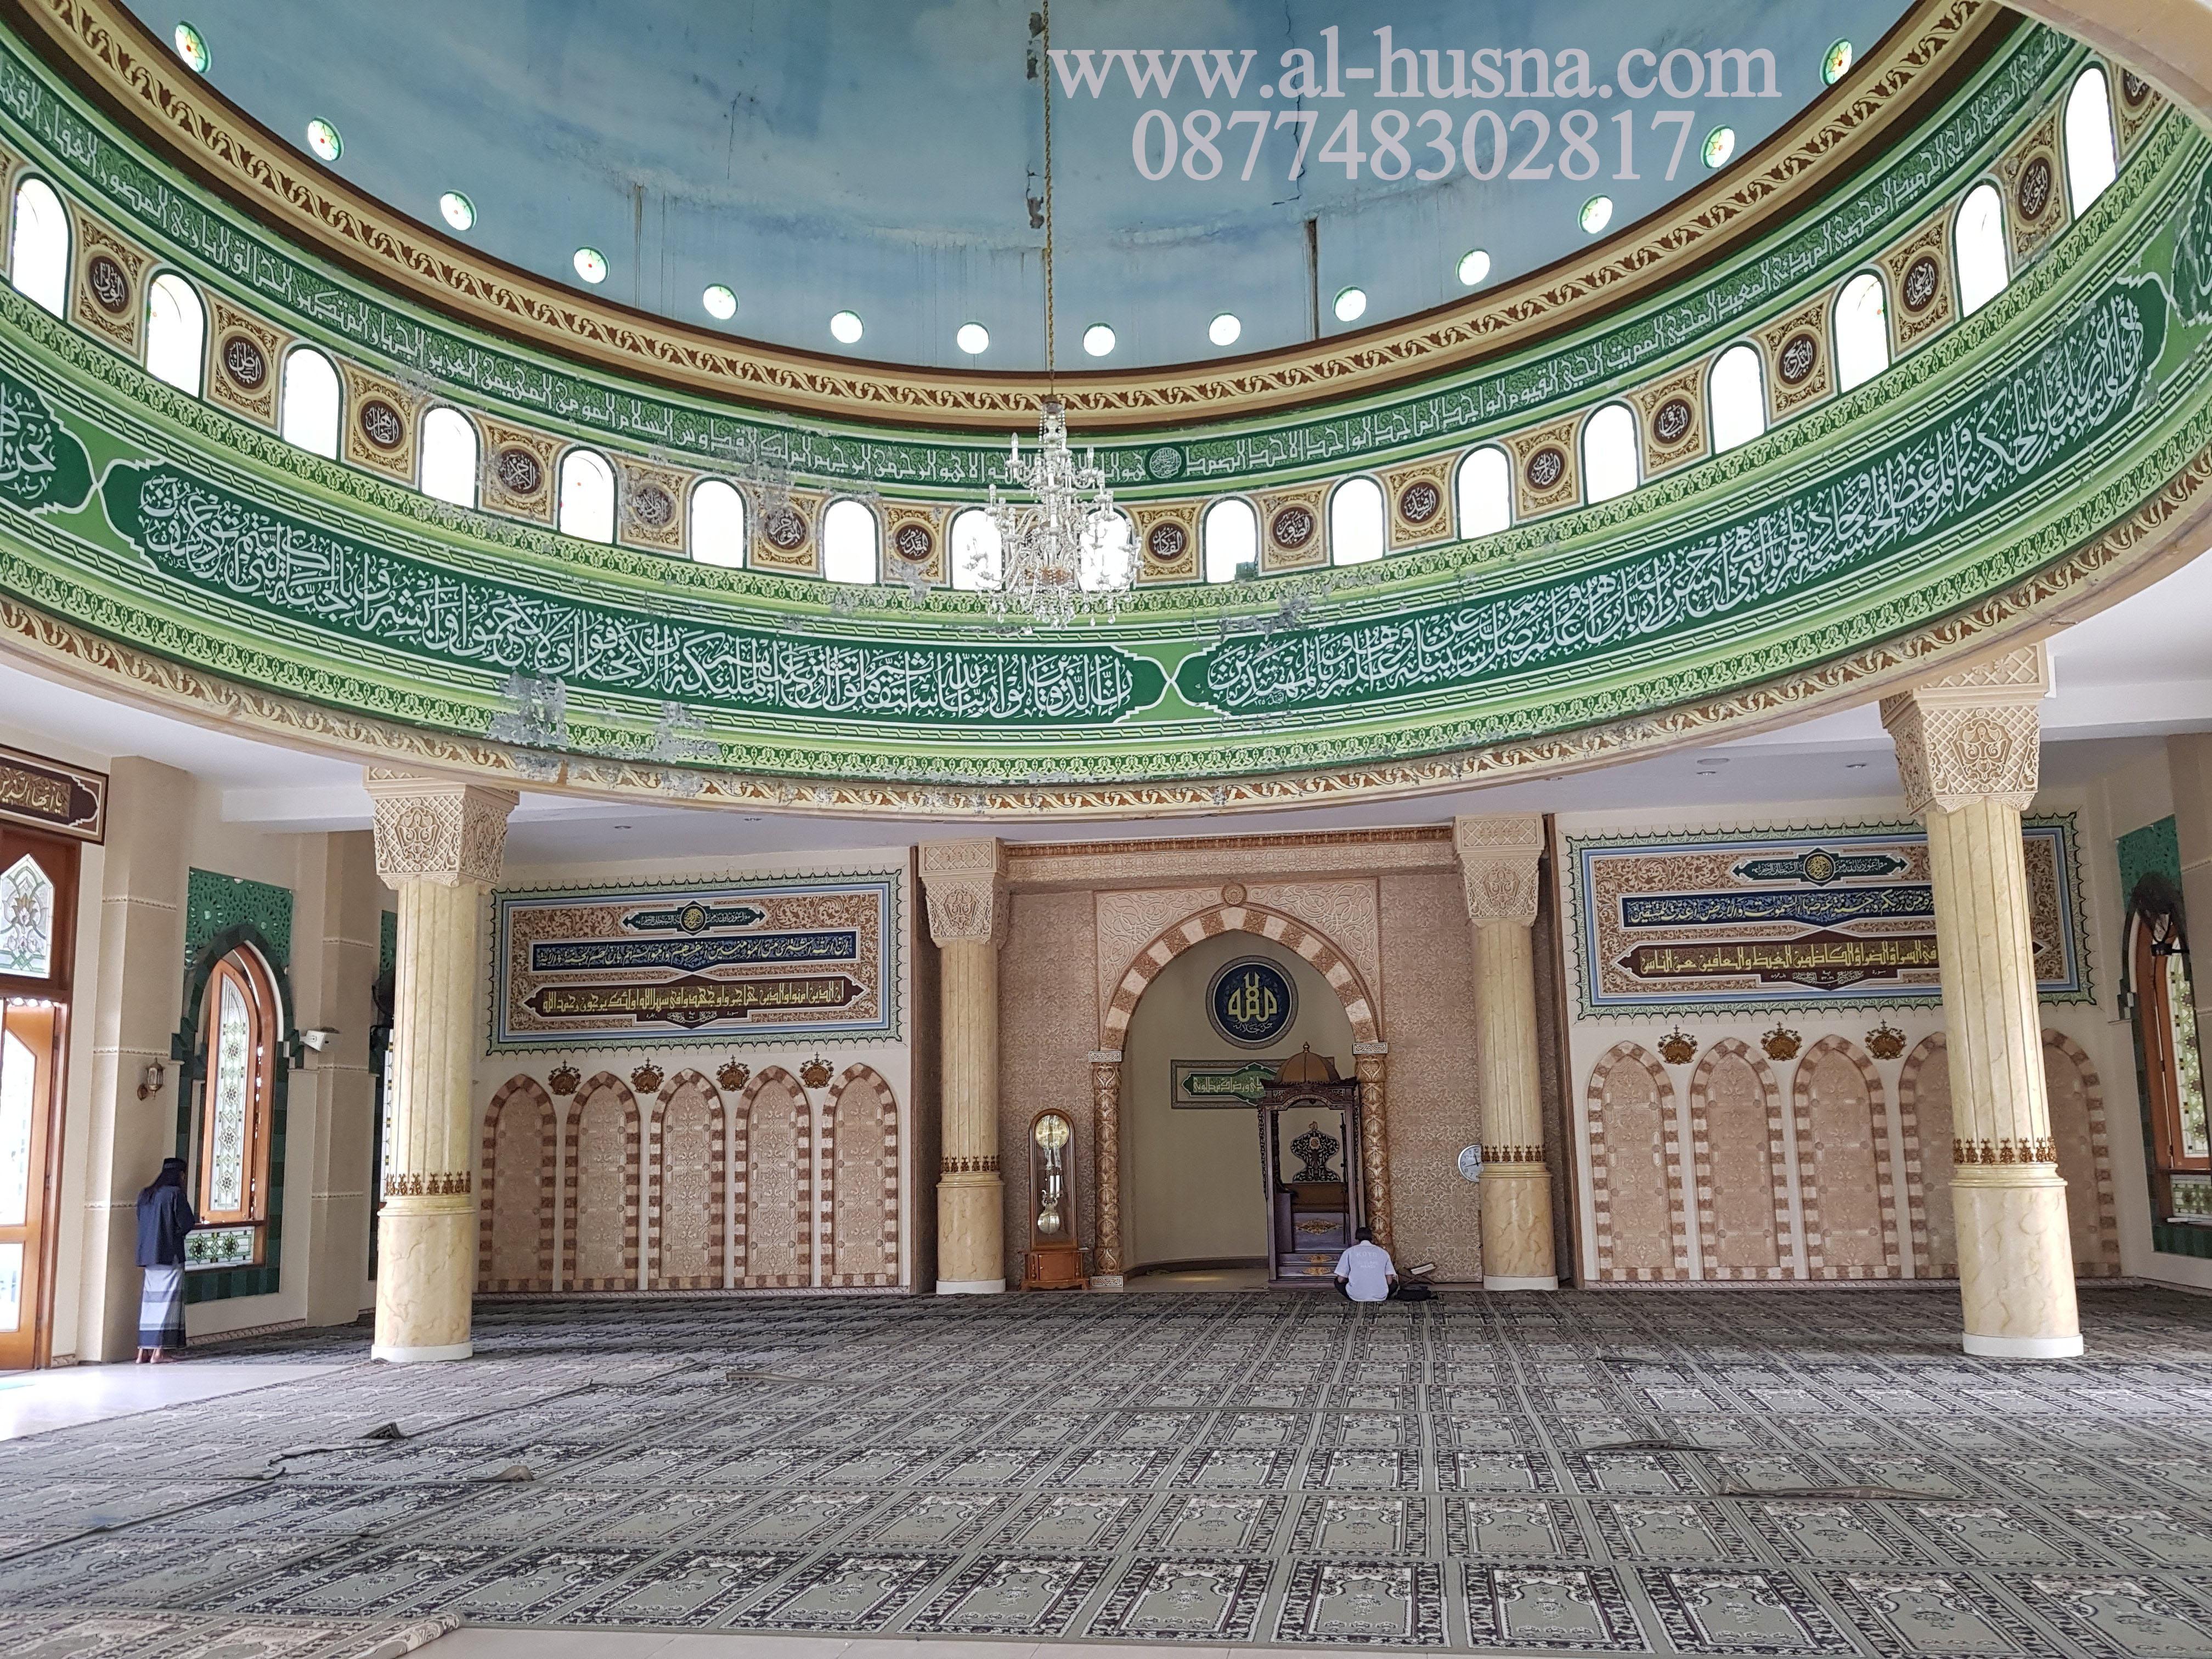 Daftar Harga Karpet Masjid Di Karangraharja